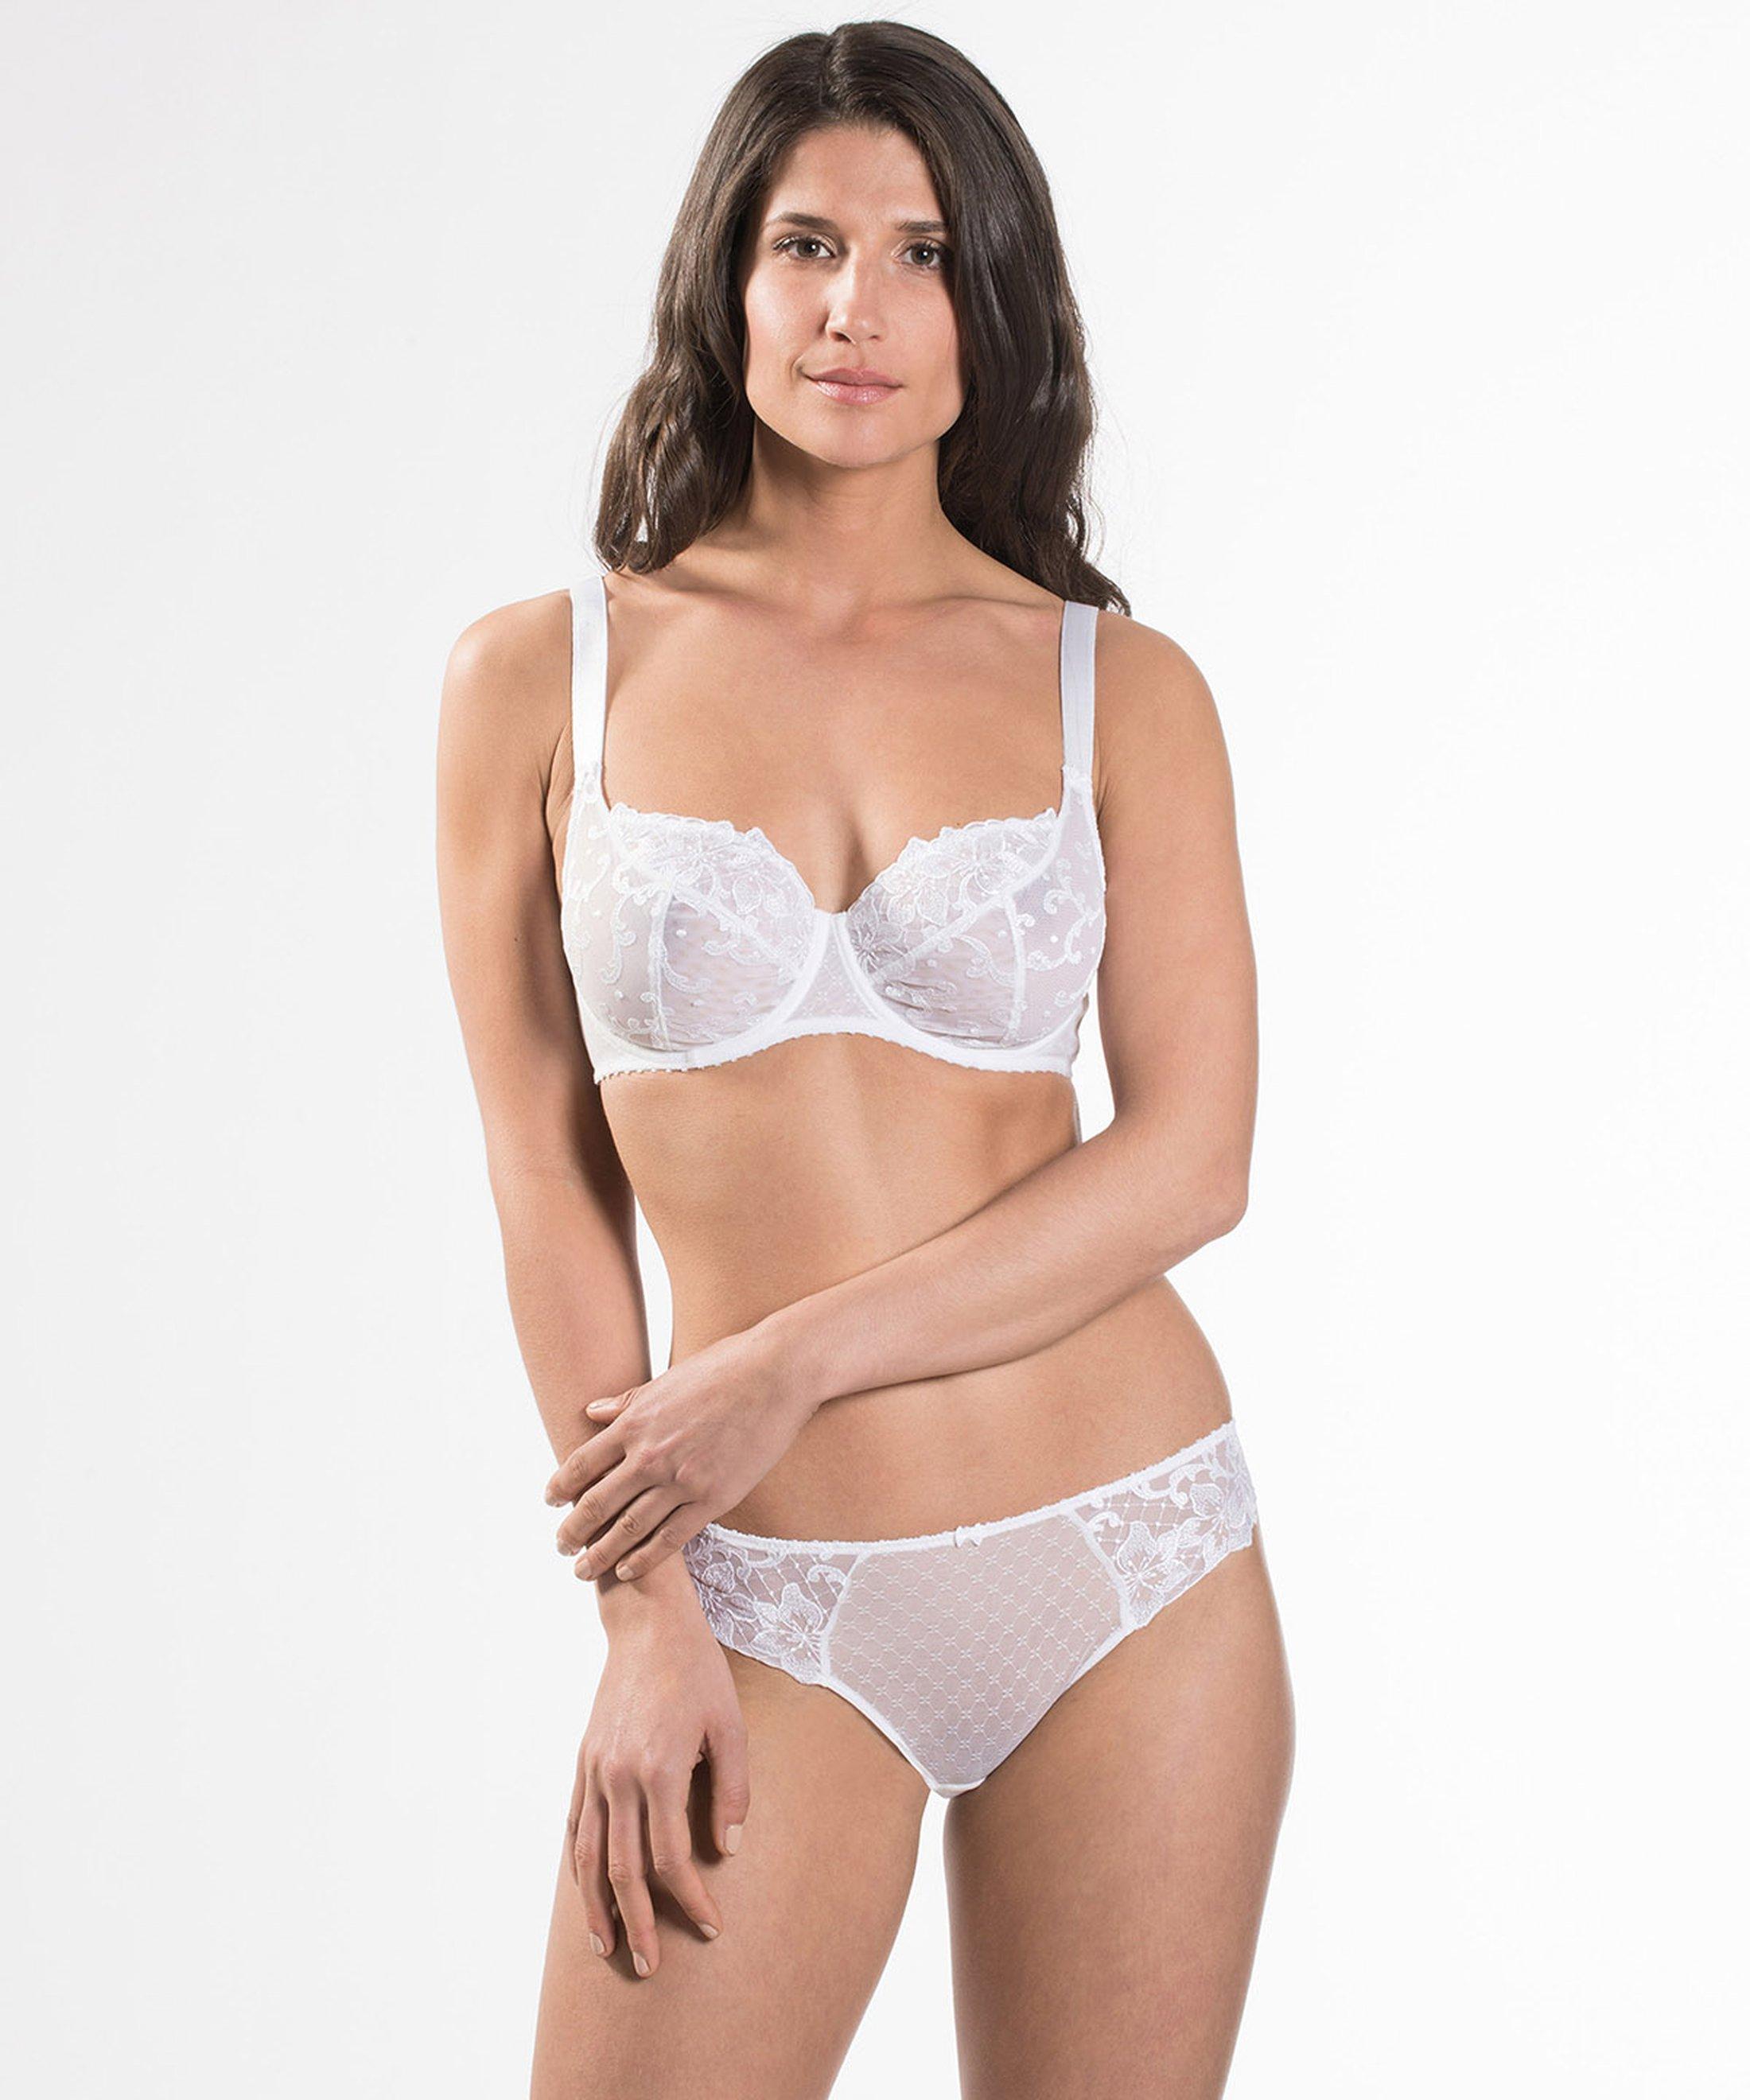 WANDERING LOVE Soutien-Gorge Emboîtant Confort White | Aubade